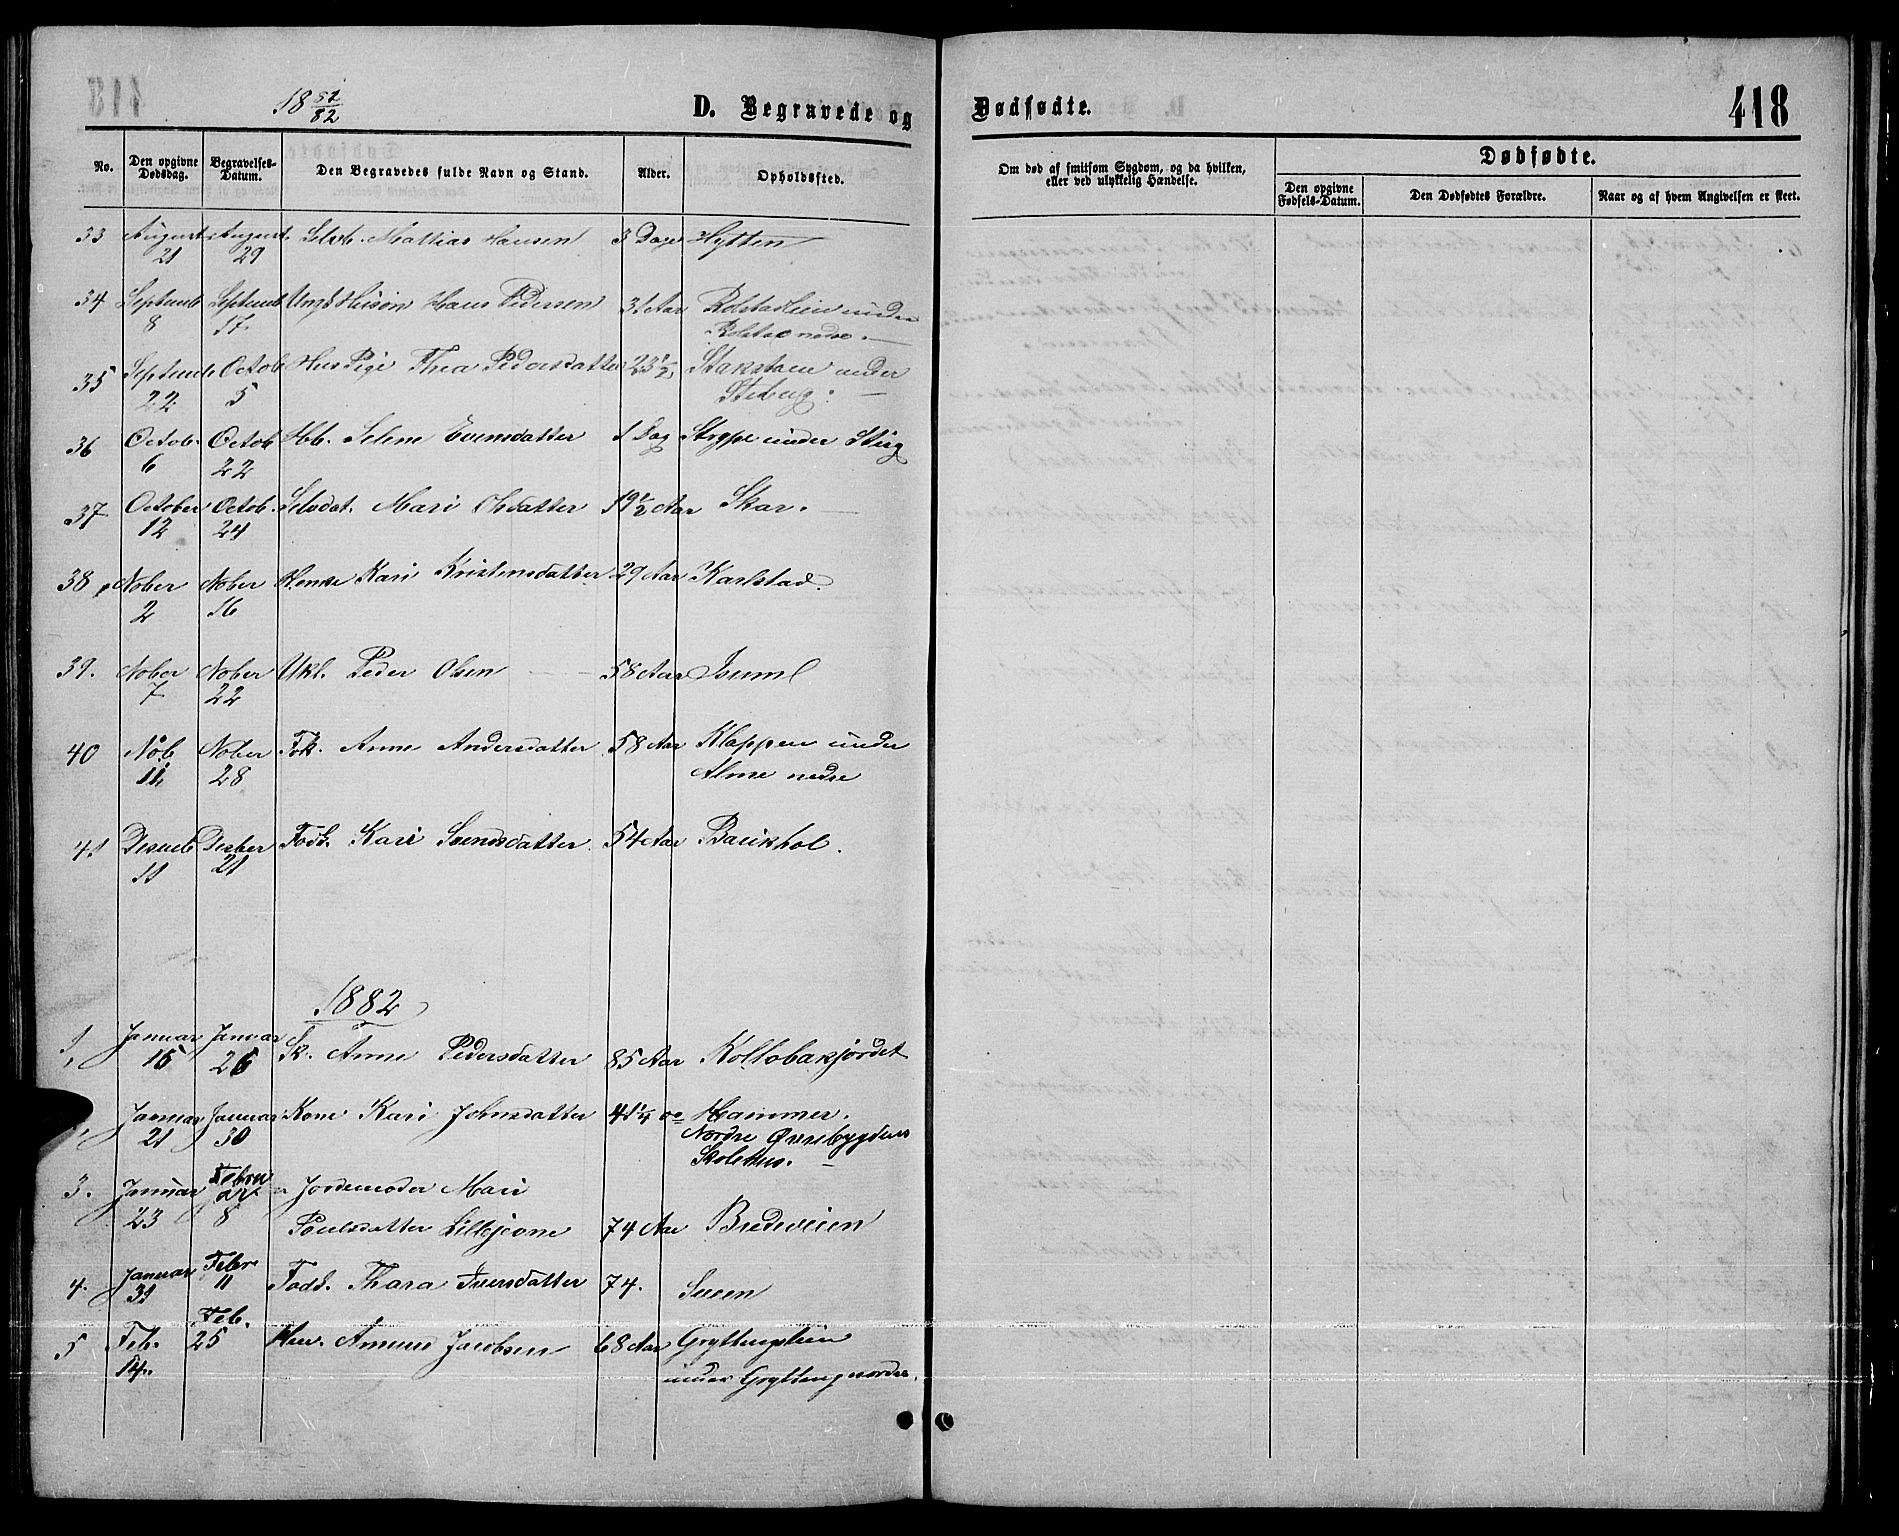 SAH, Sør-Fron prestekontor, H/Ha/Hab/L0002: Klokkerbok nr. 2, 1864-1883, s. 418